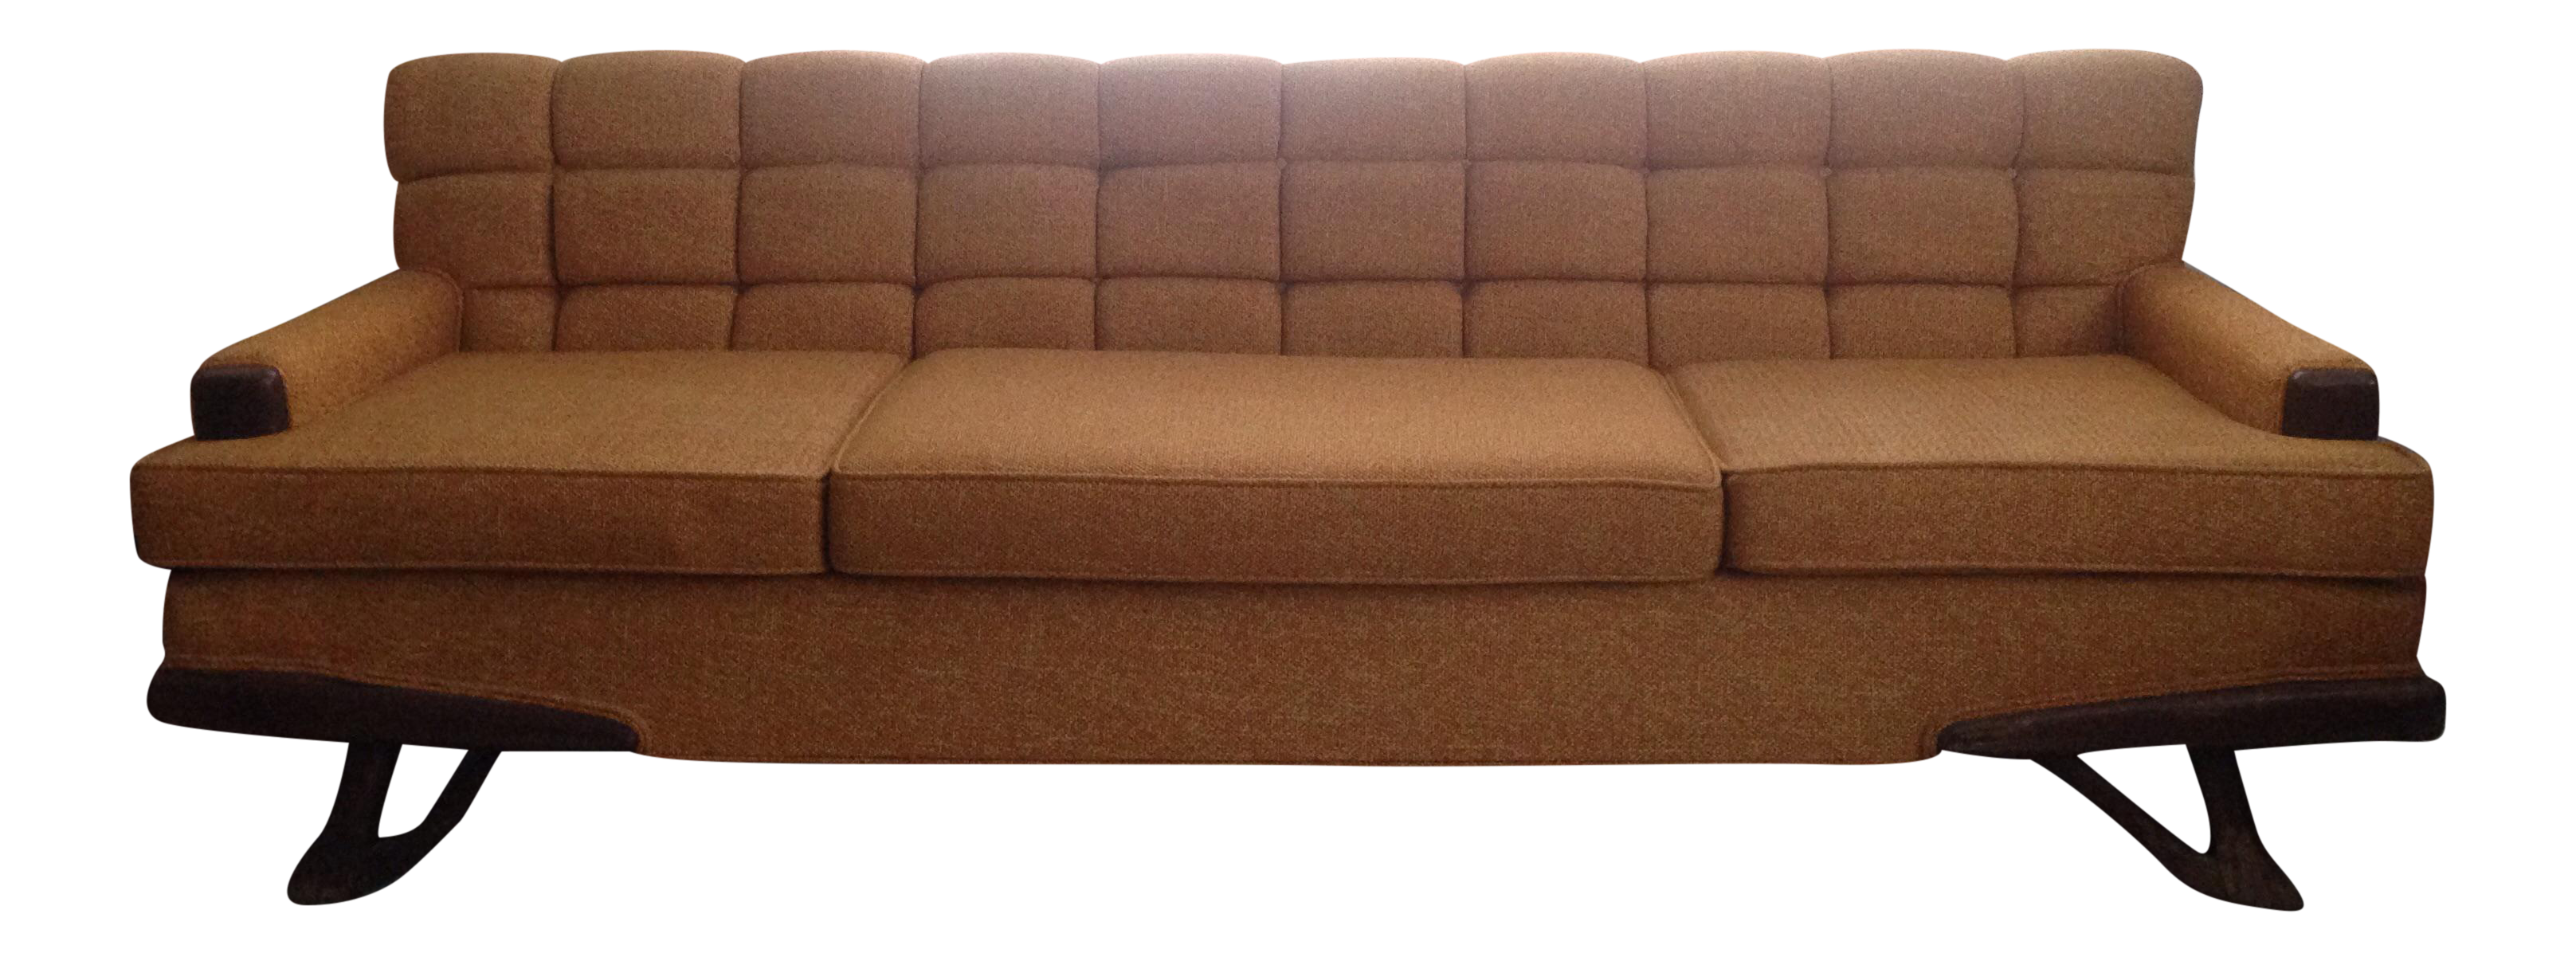 Vintage Sears Howard Parlor Mid Century Sofa